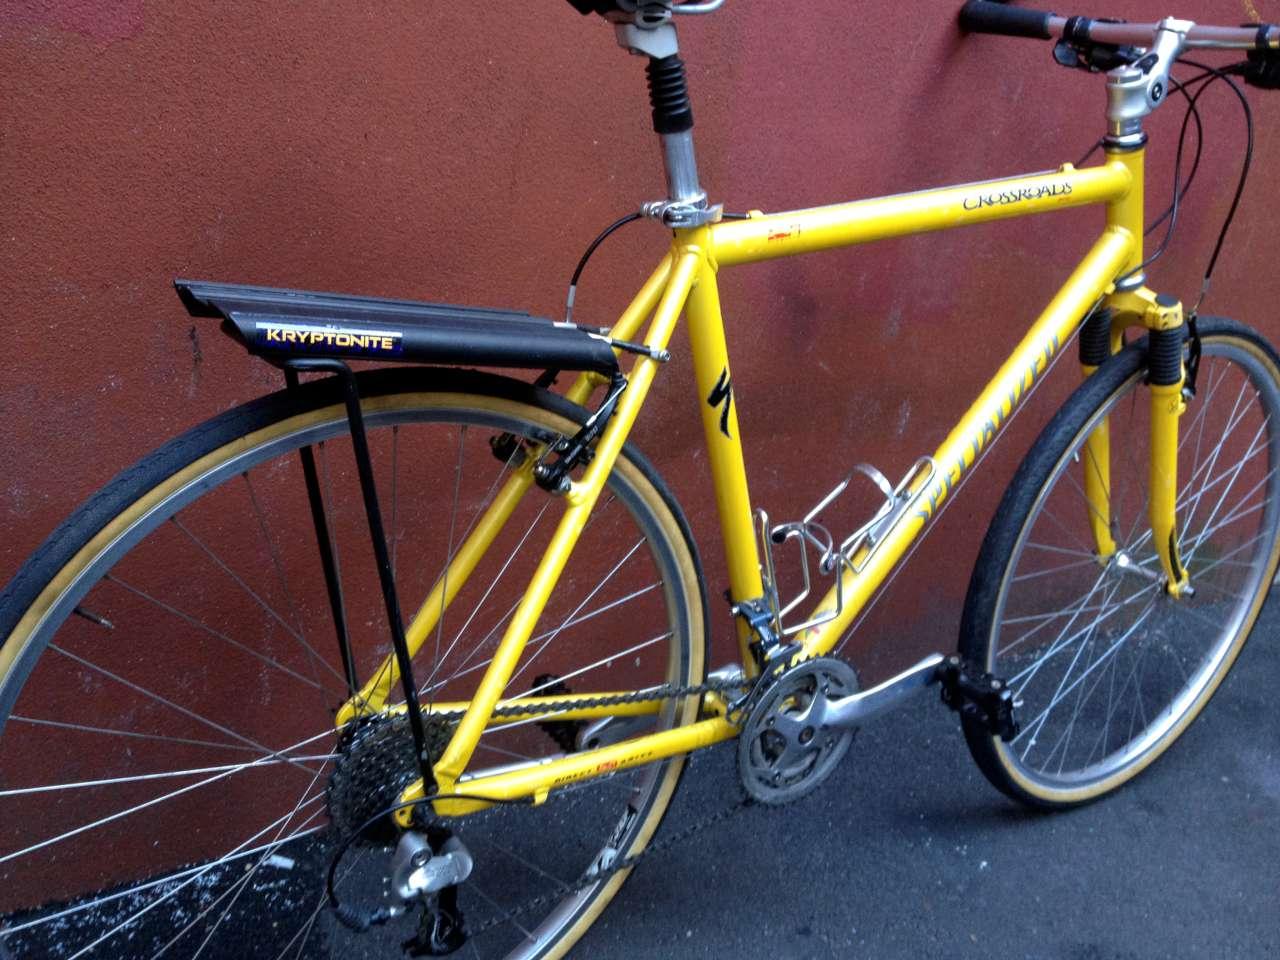 Bike Boom refurbished bikes: 1999 Specialized crossroads pro